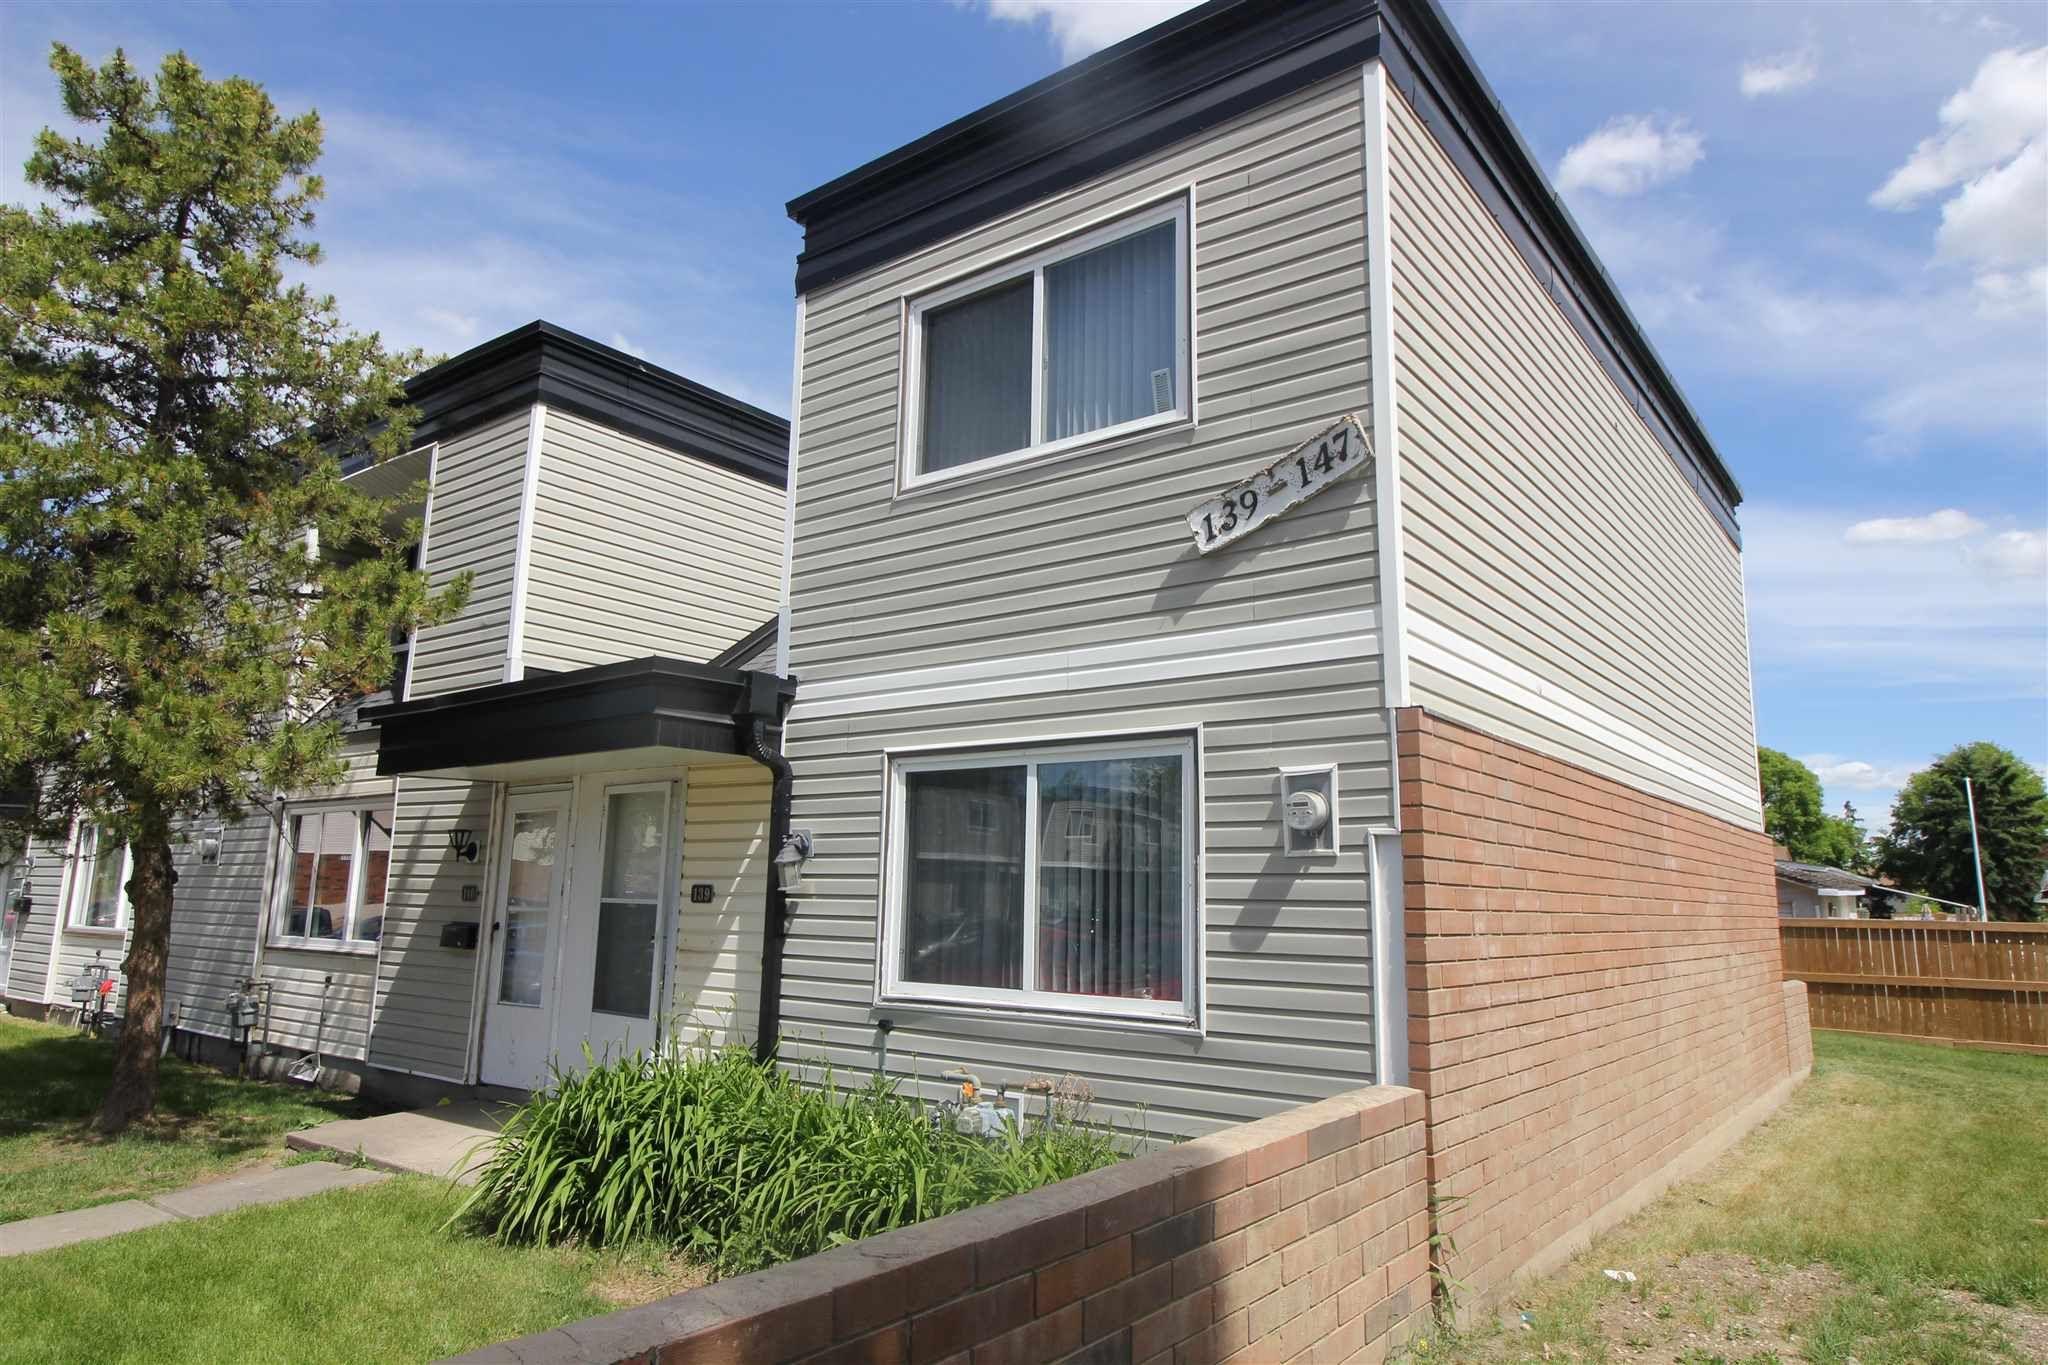 Main Photo: 139 3308 113 Avenue in Edmonton: Zone 23 Townhouse for sale : MLS®# E4248266